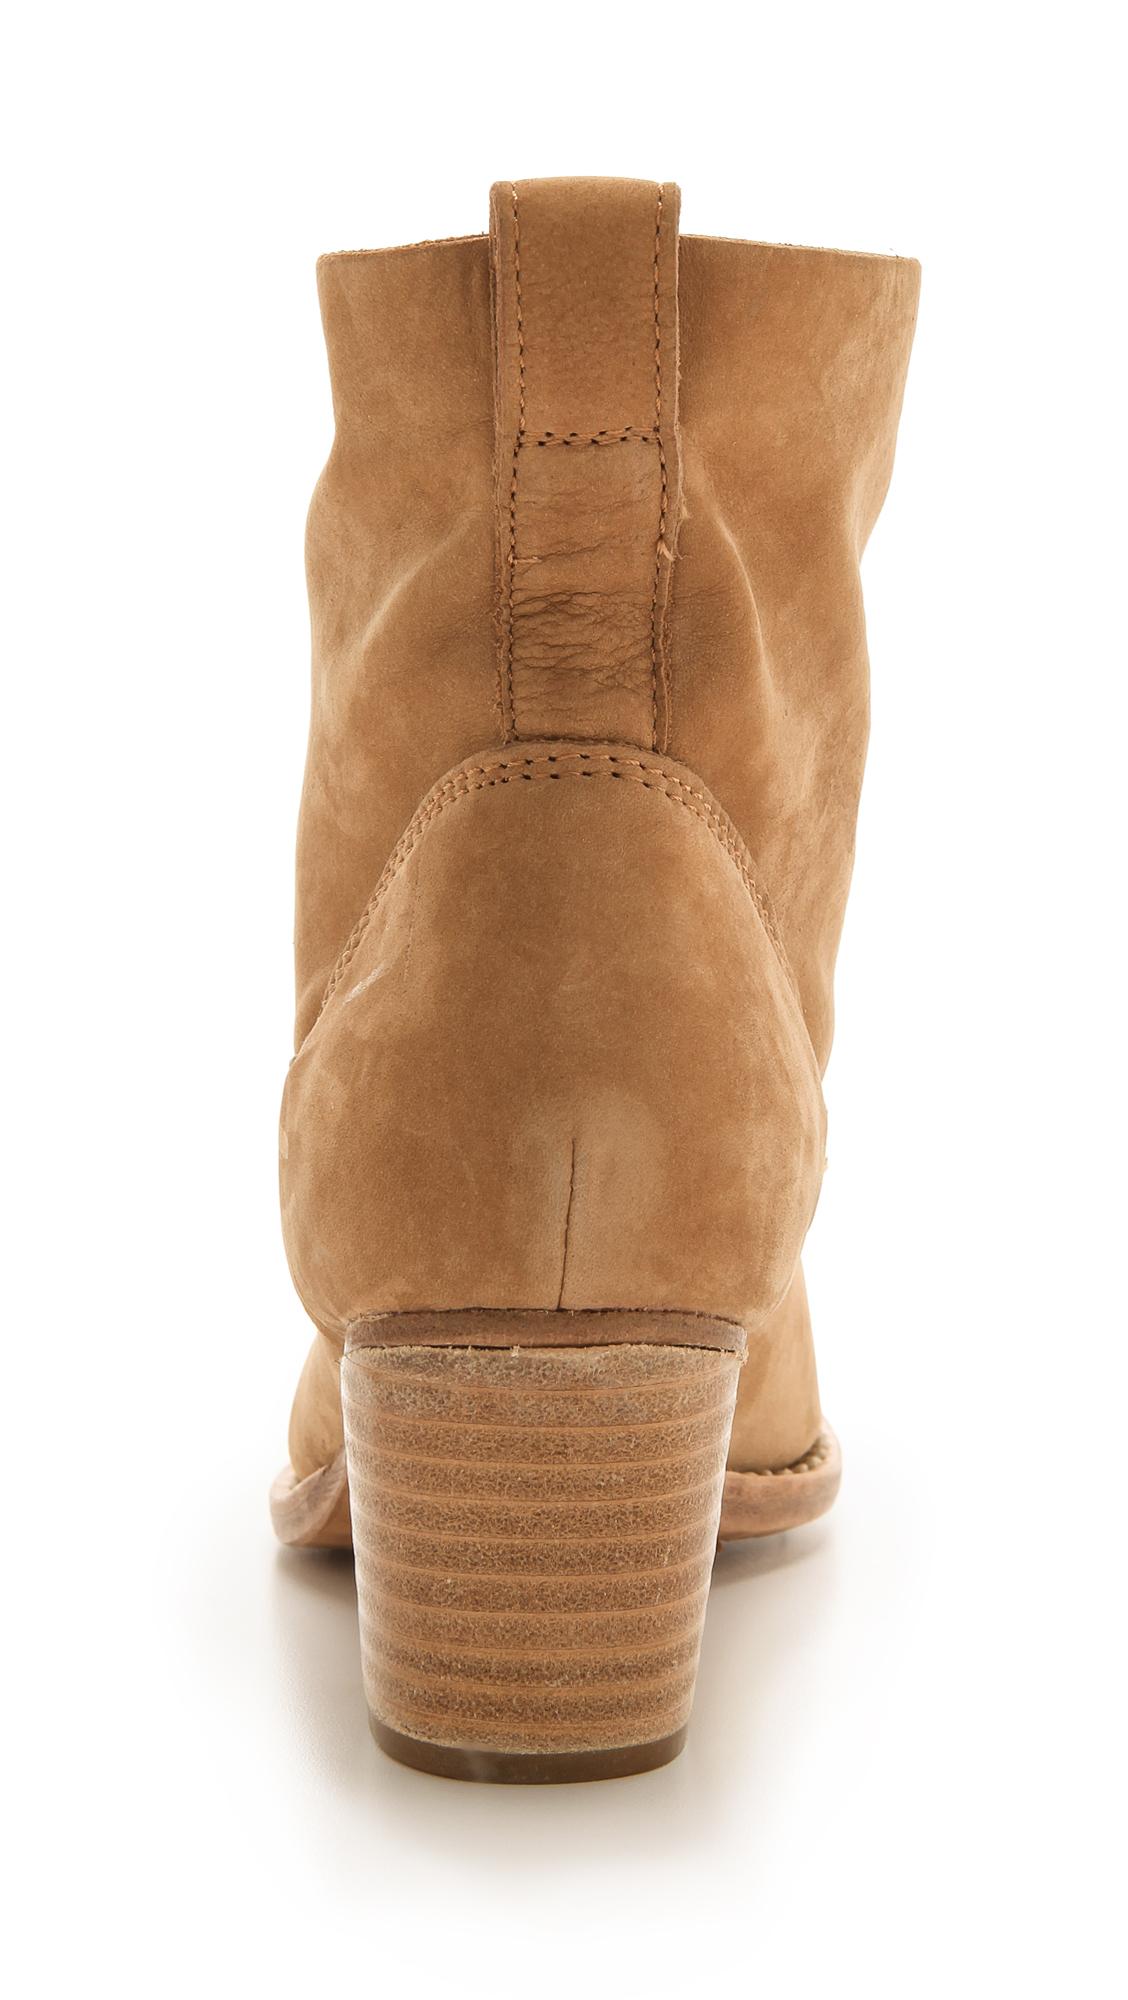 Rag & Bone Mercer Boot Ii in Camel (Brown)